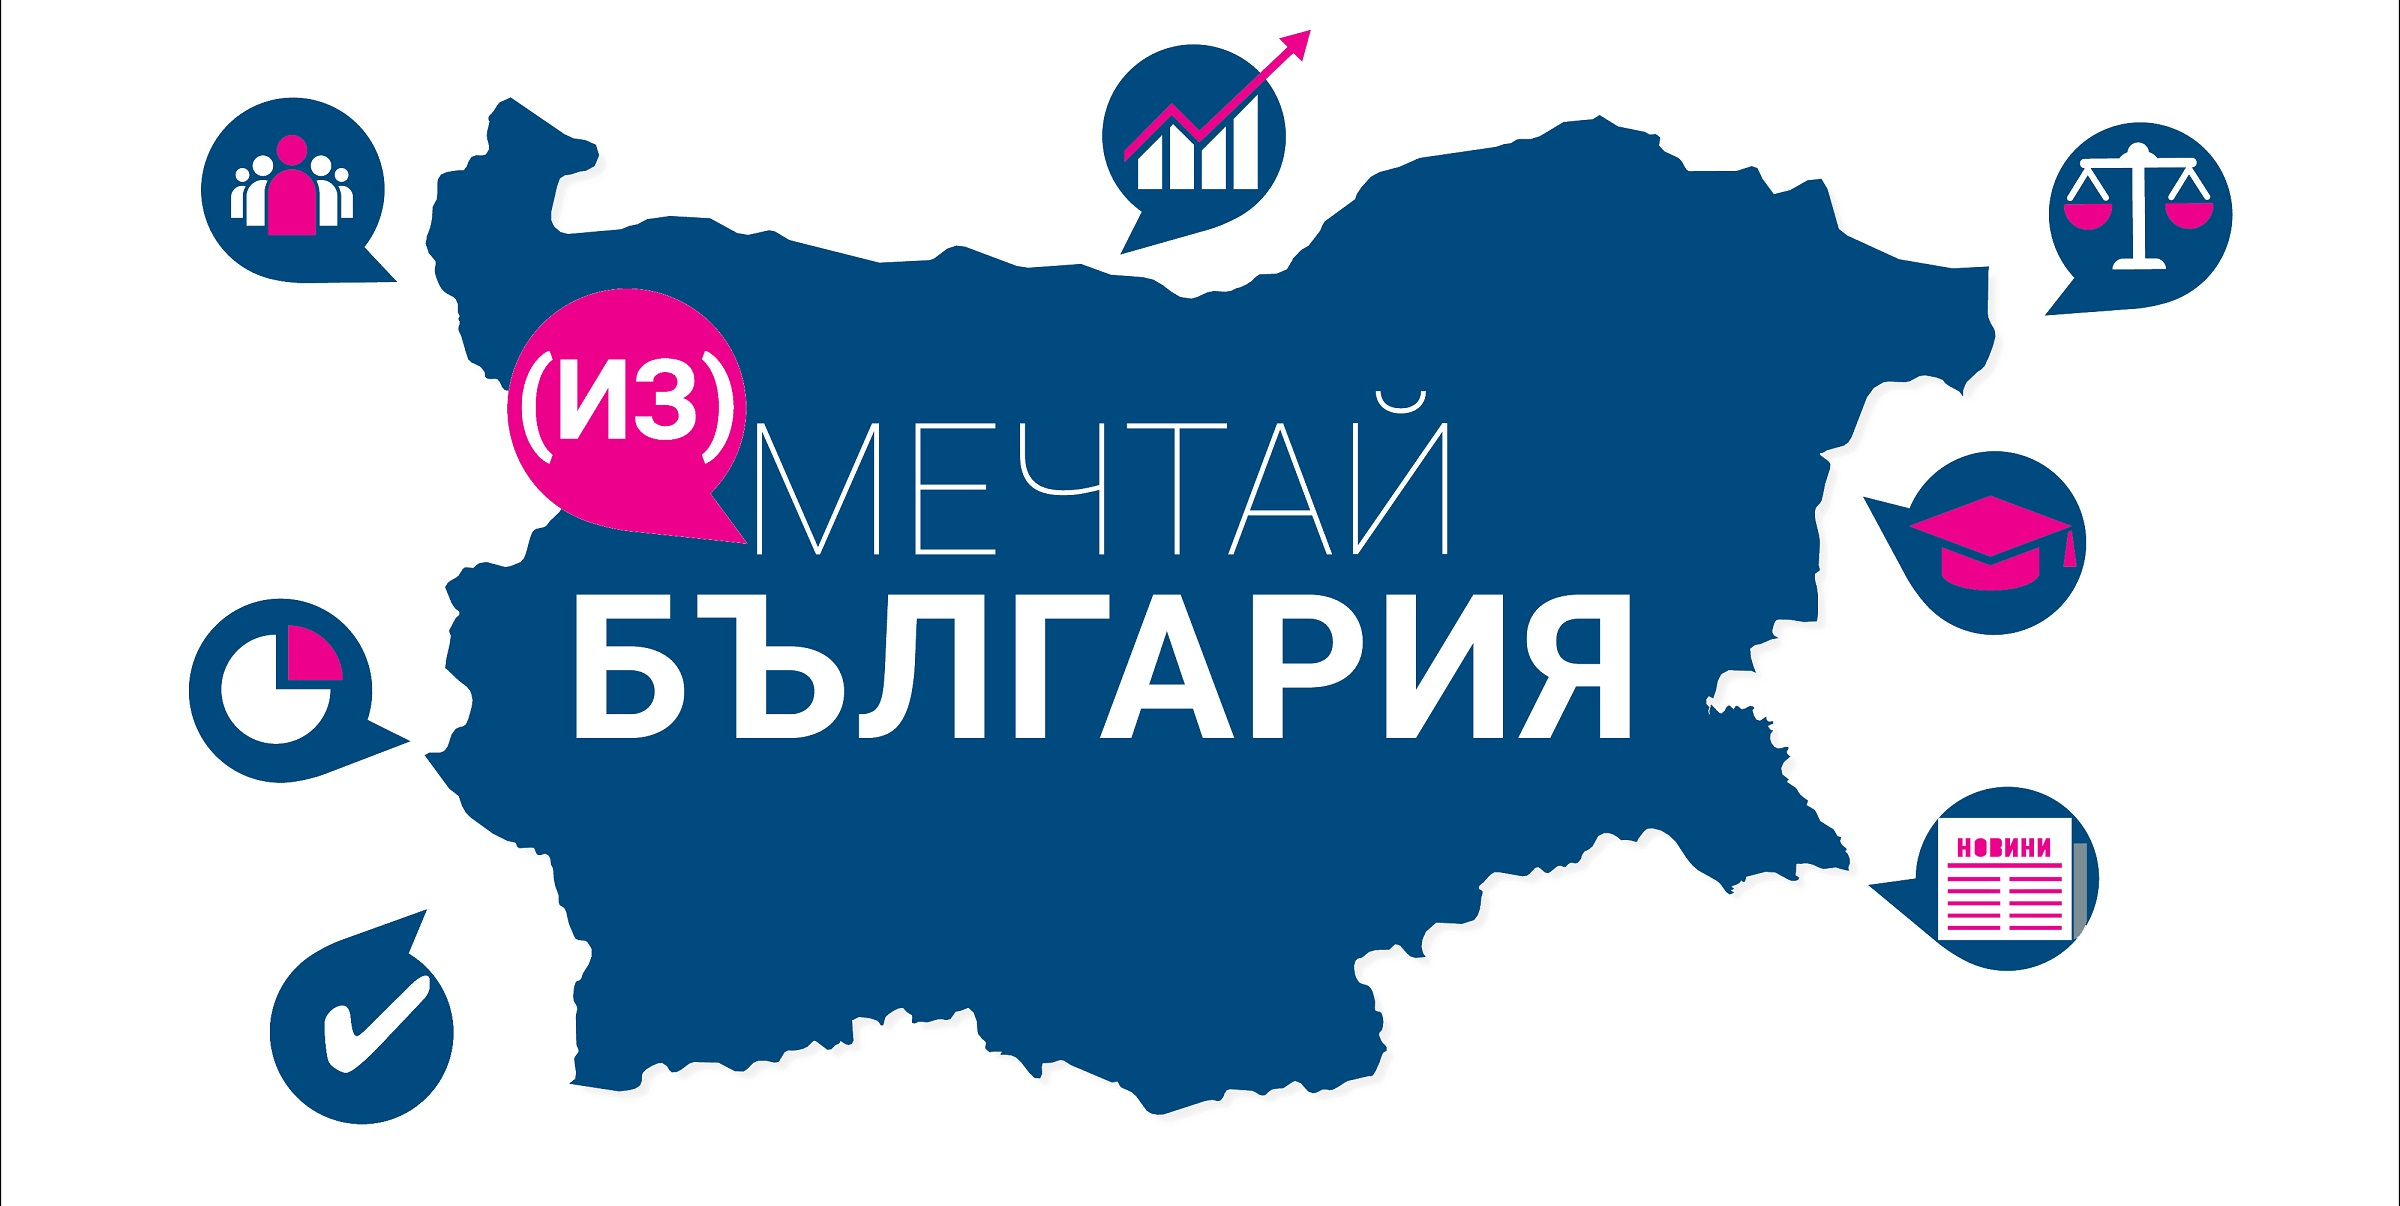 Dream Bulgaria - The Future of Democracy in Bulgaria